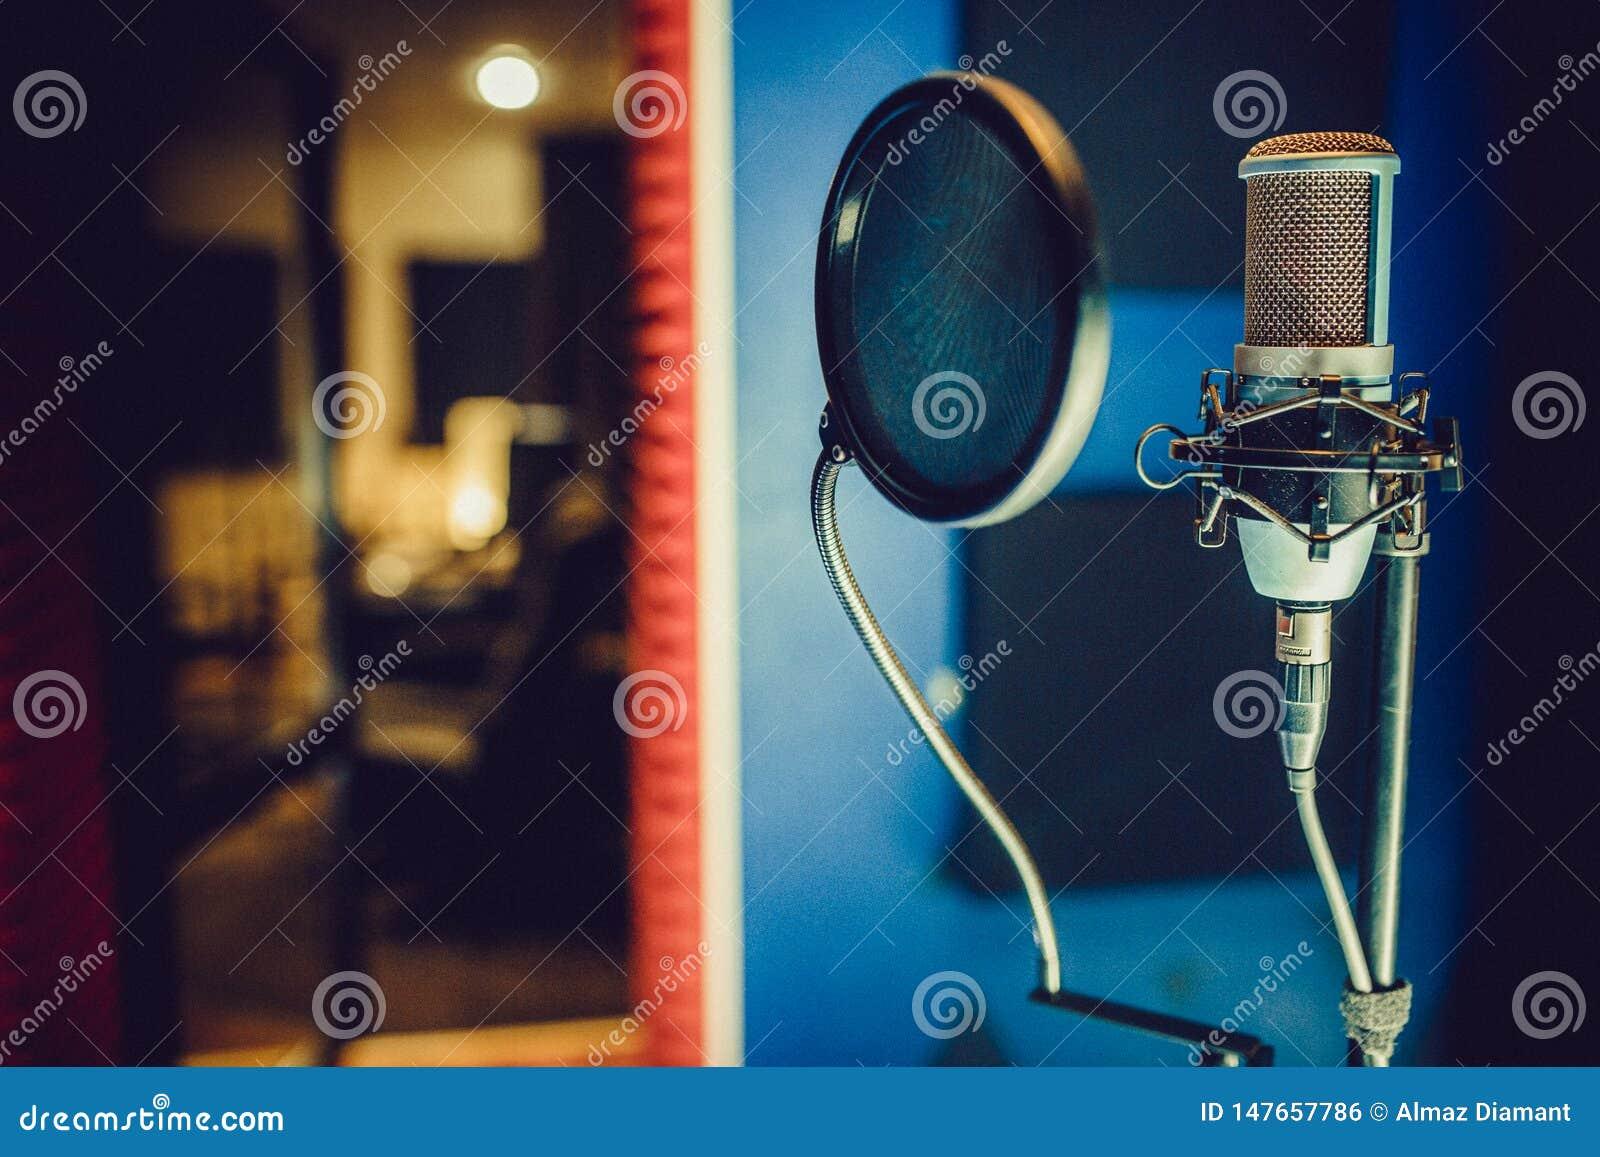 Condenser microphone in a recording studio, pop filter